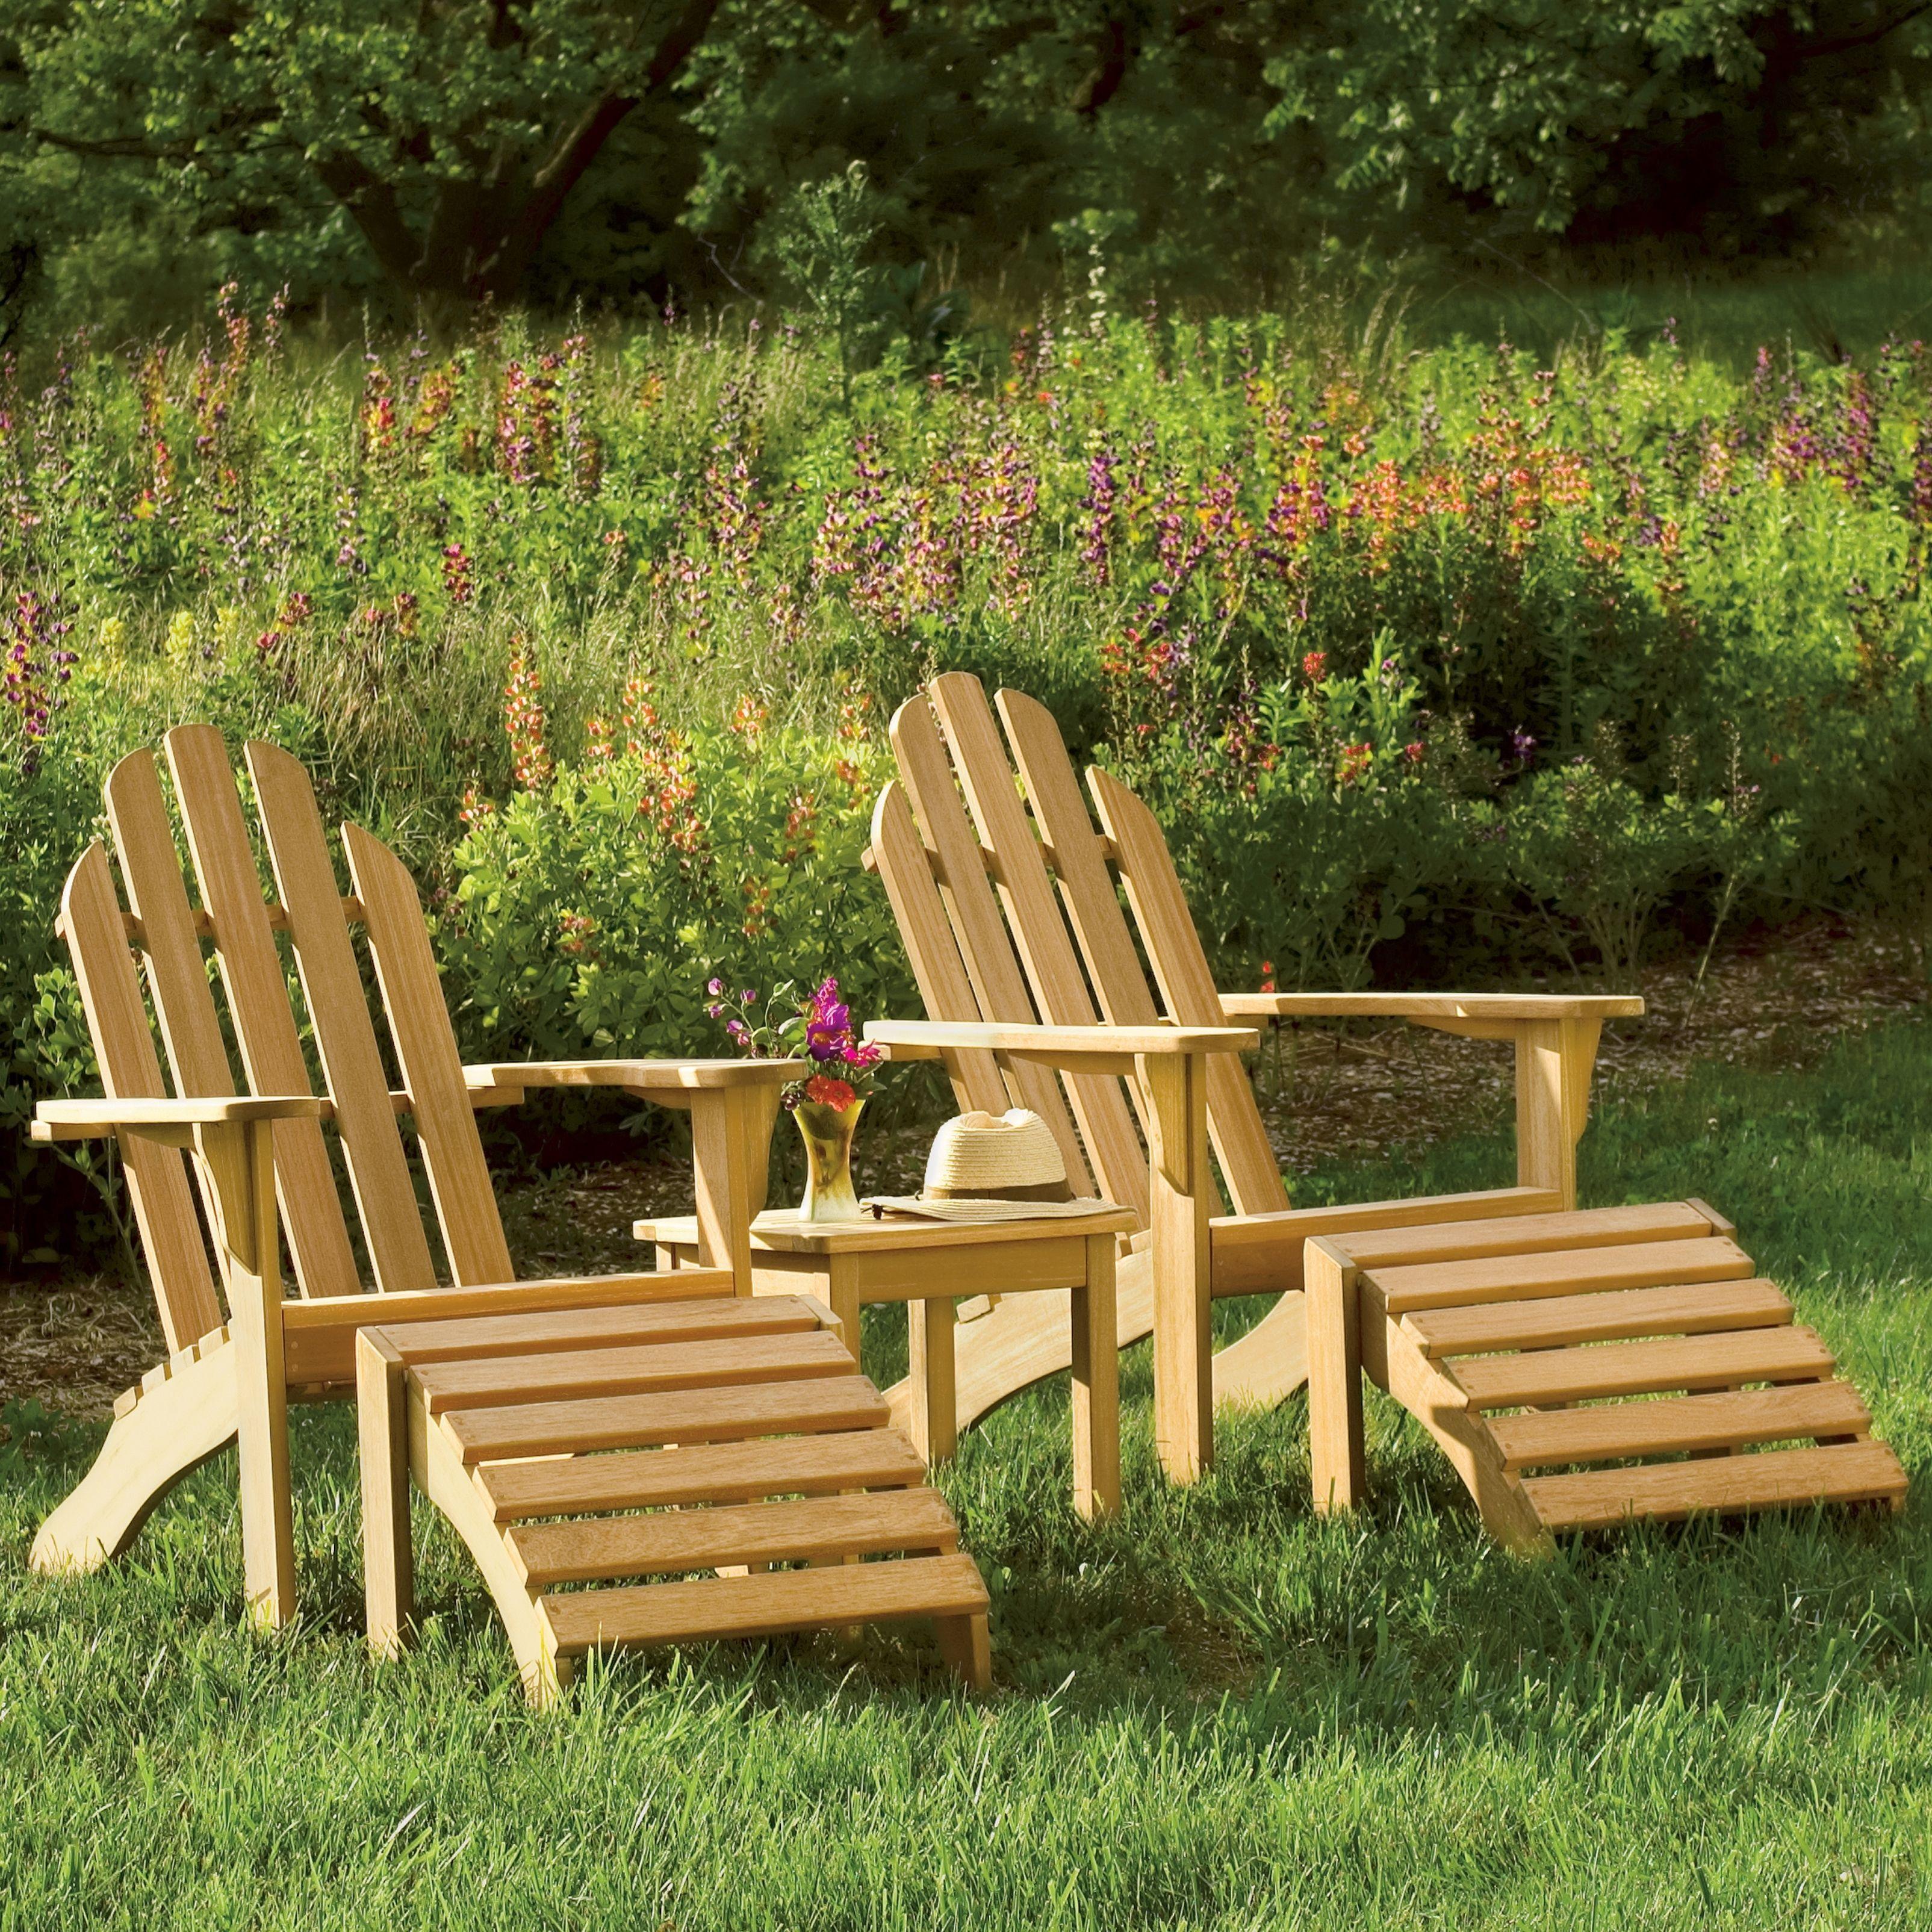 Backyard Creations Hammock Lounge Chair